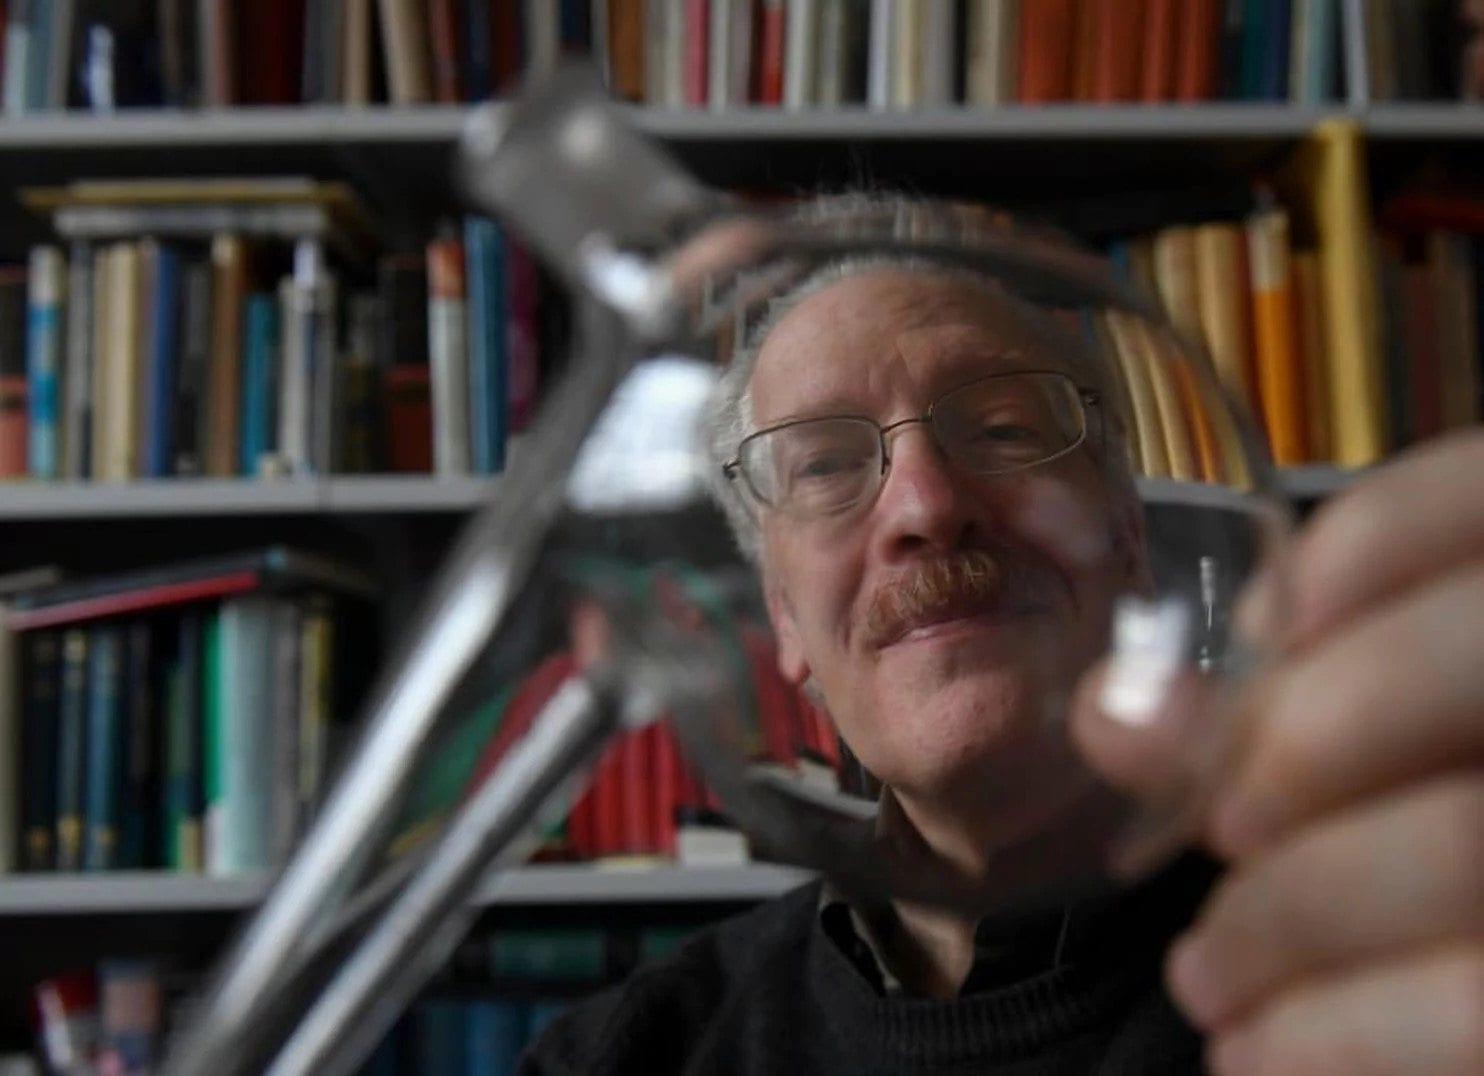 This chemist is unlocking the secrets of alchemy